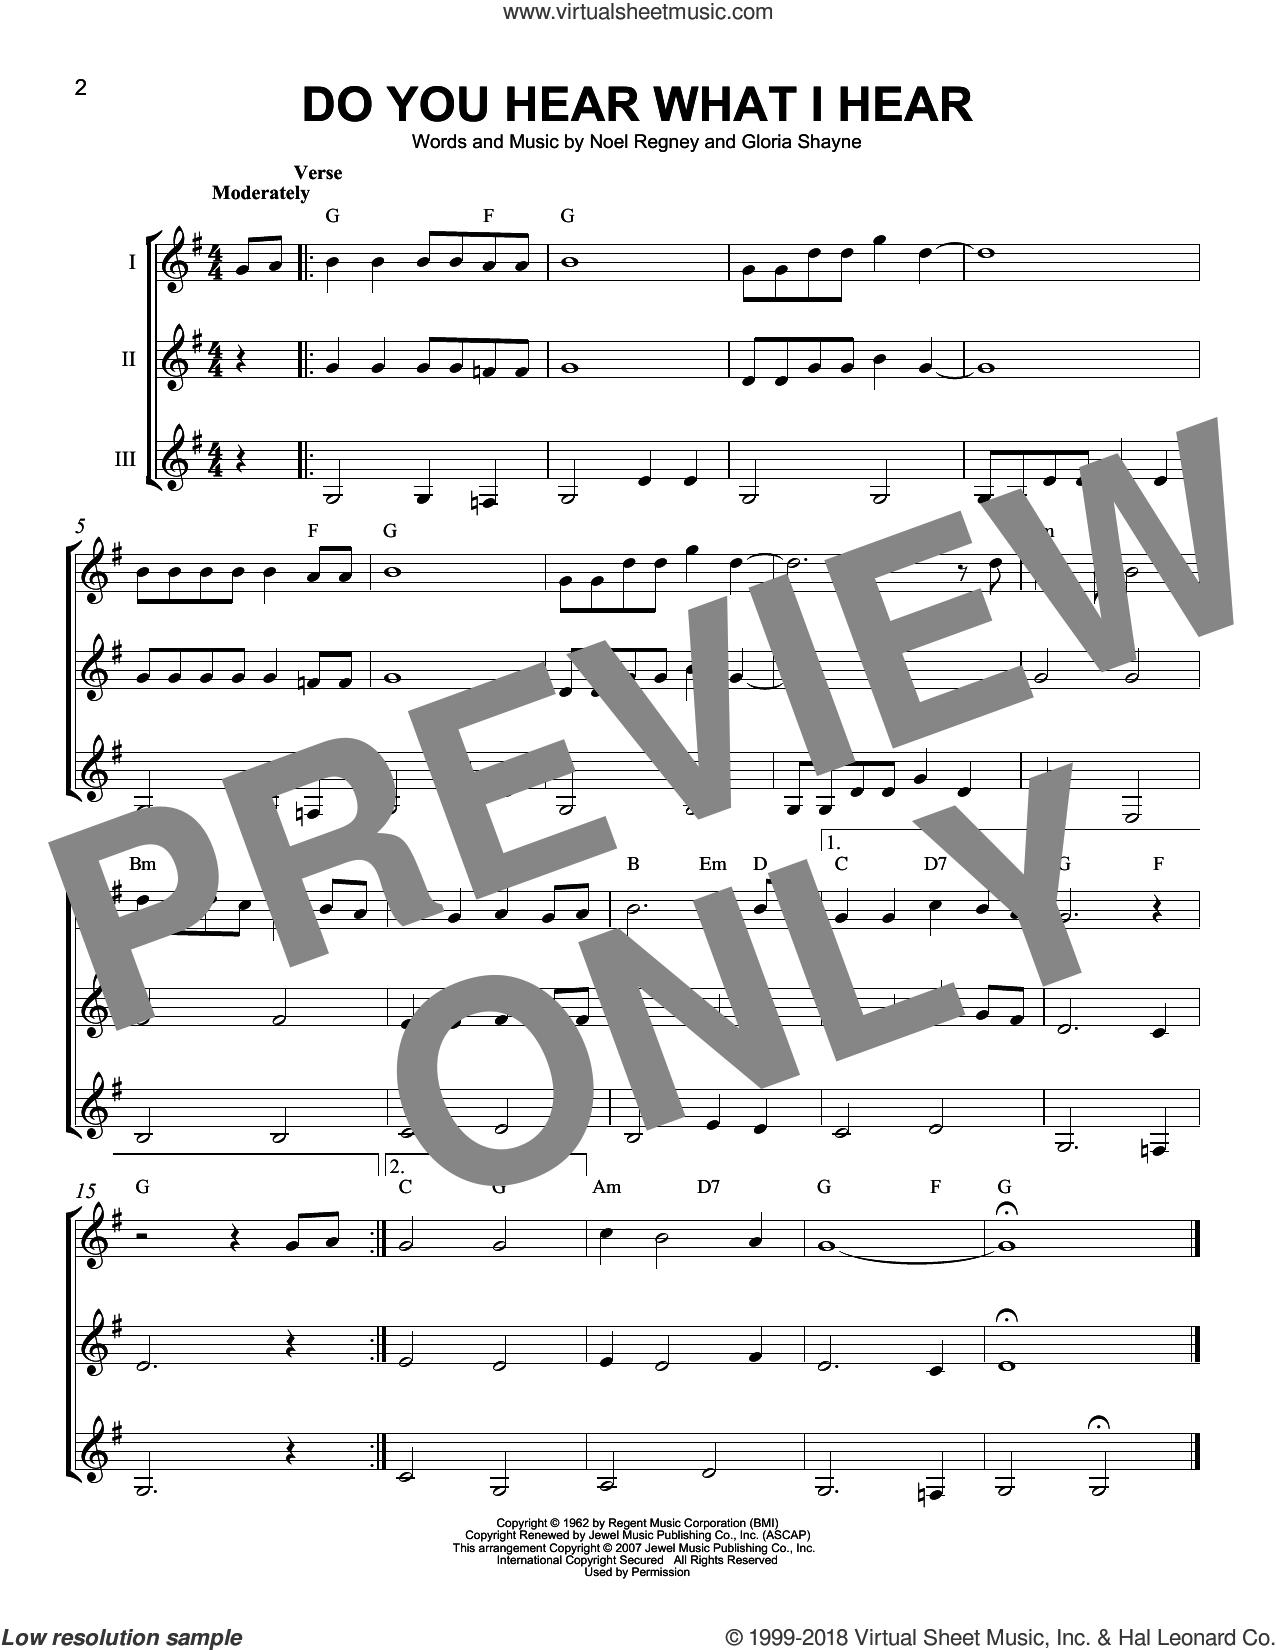 Do You Hear What I Hear sheet music for guitar ensemble by Noel Regney & Gloria Shayne, Carole King, Carrie Underwood, Gloria Shayne and Noel Regney, intermediate skill level